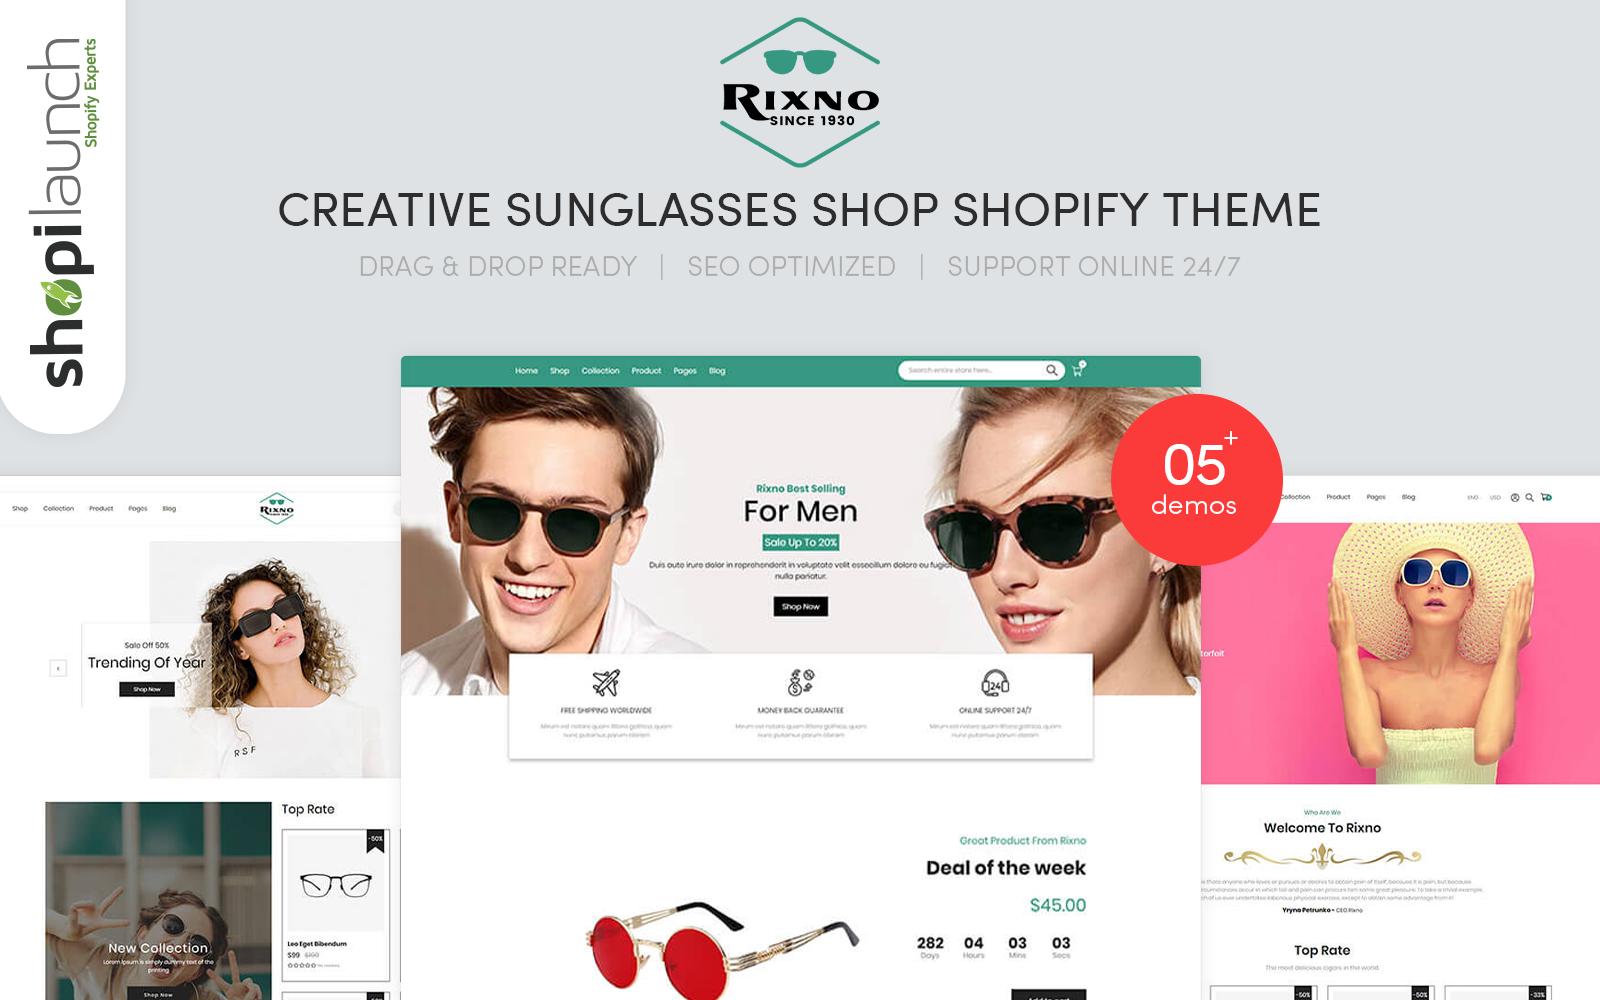 Reszponzív Rixno - Creative Sunglasses Shop Shopify sablon 102403